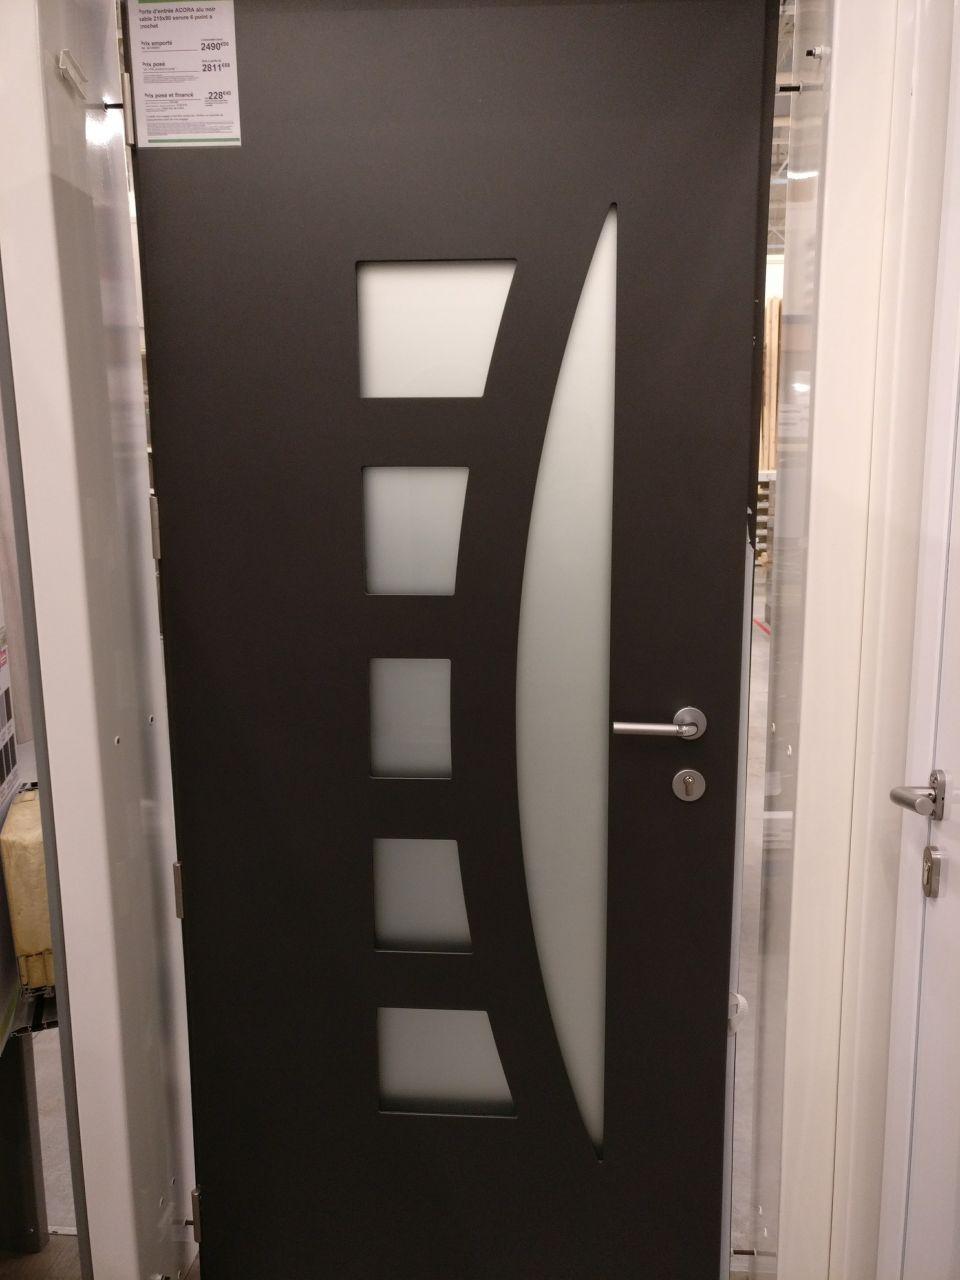 Porte d'entrée Acora Excellence en aluminium noir sable RAL 2100 Leroy-Merlin